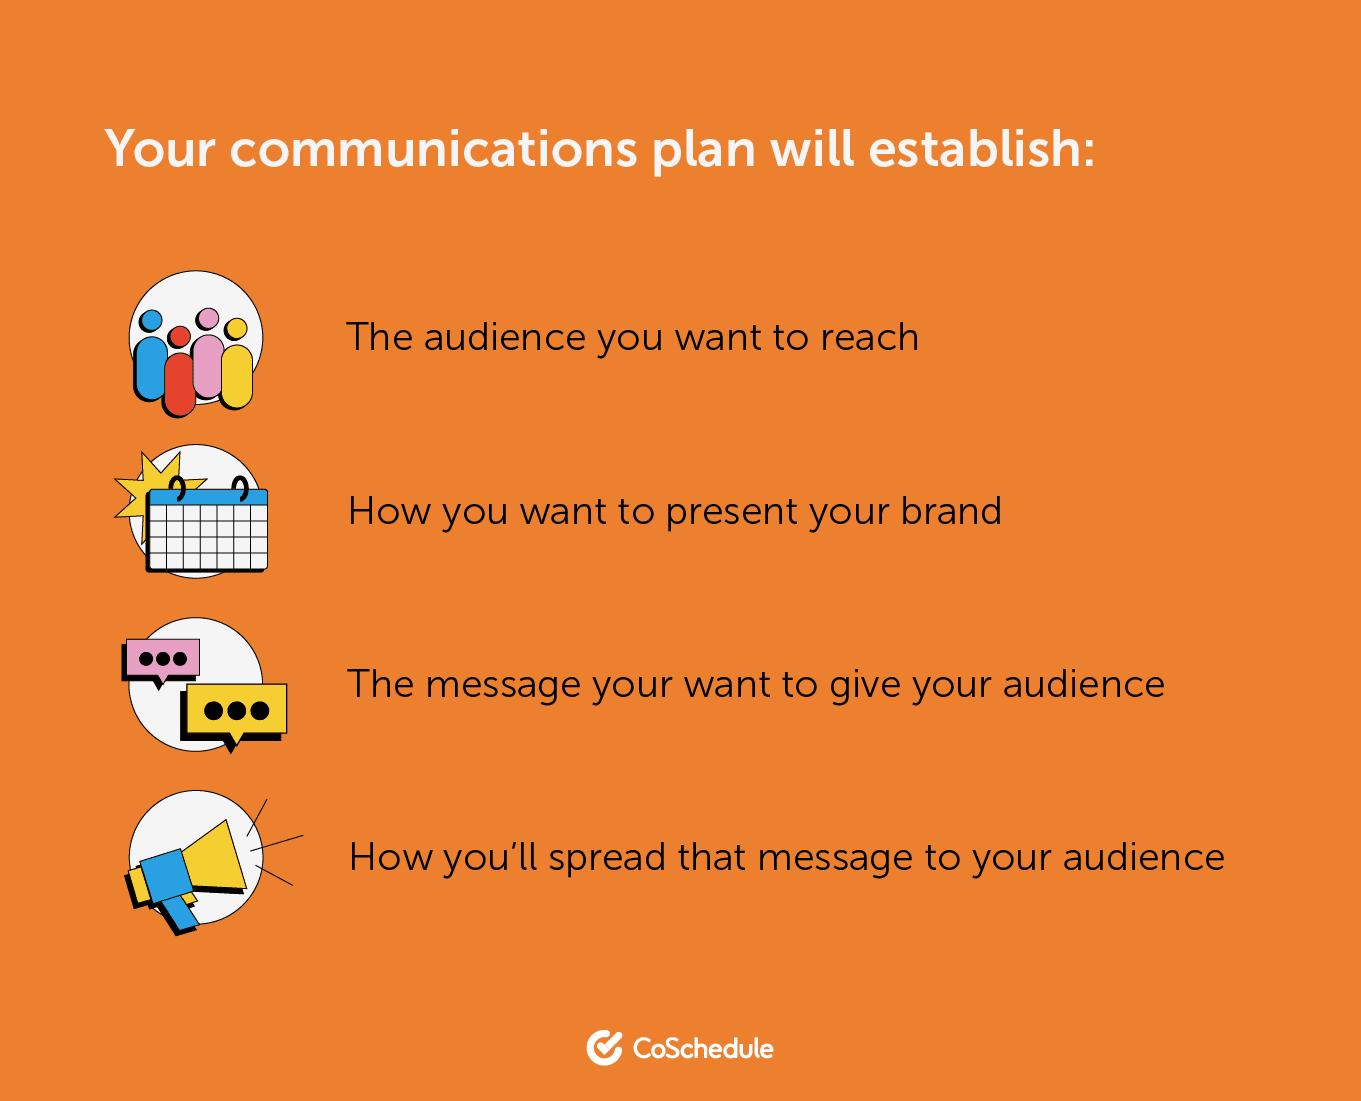 Your communications plan will establish